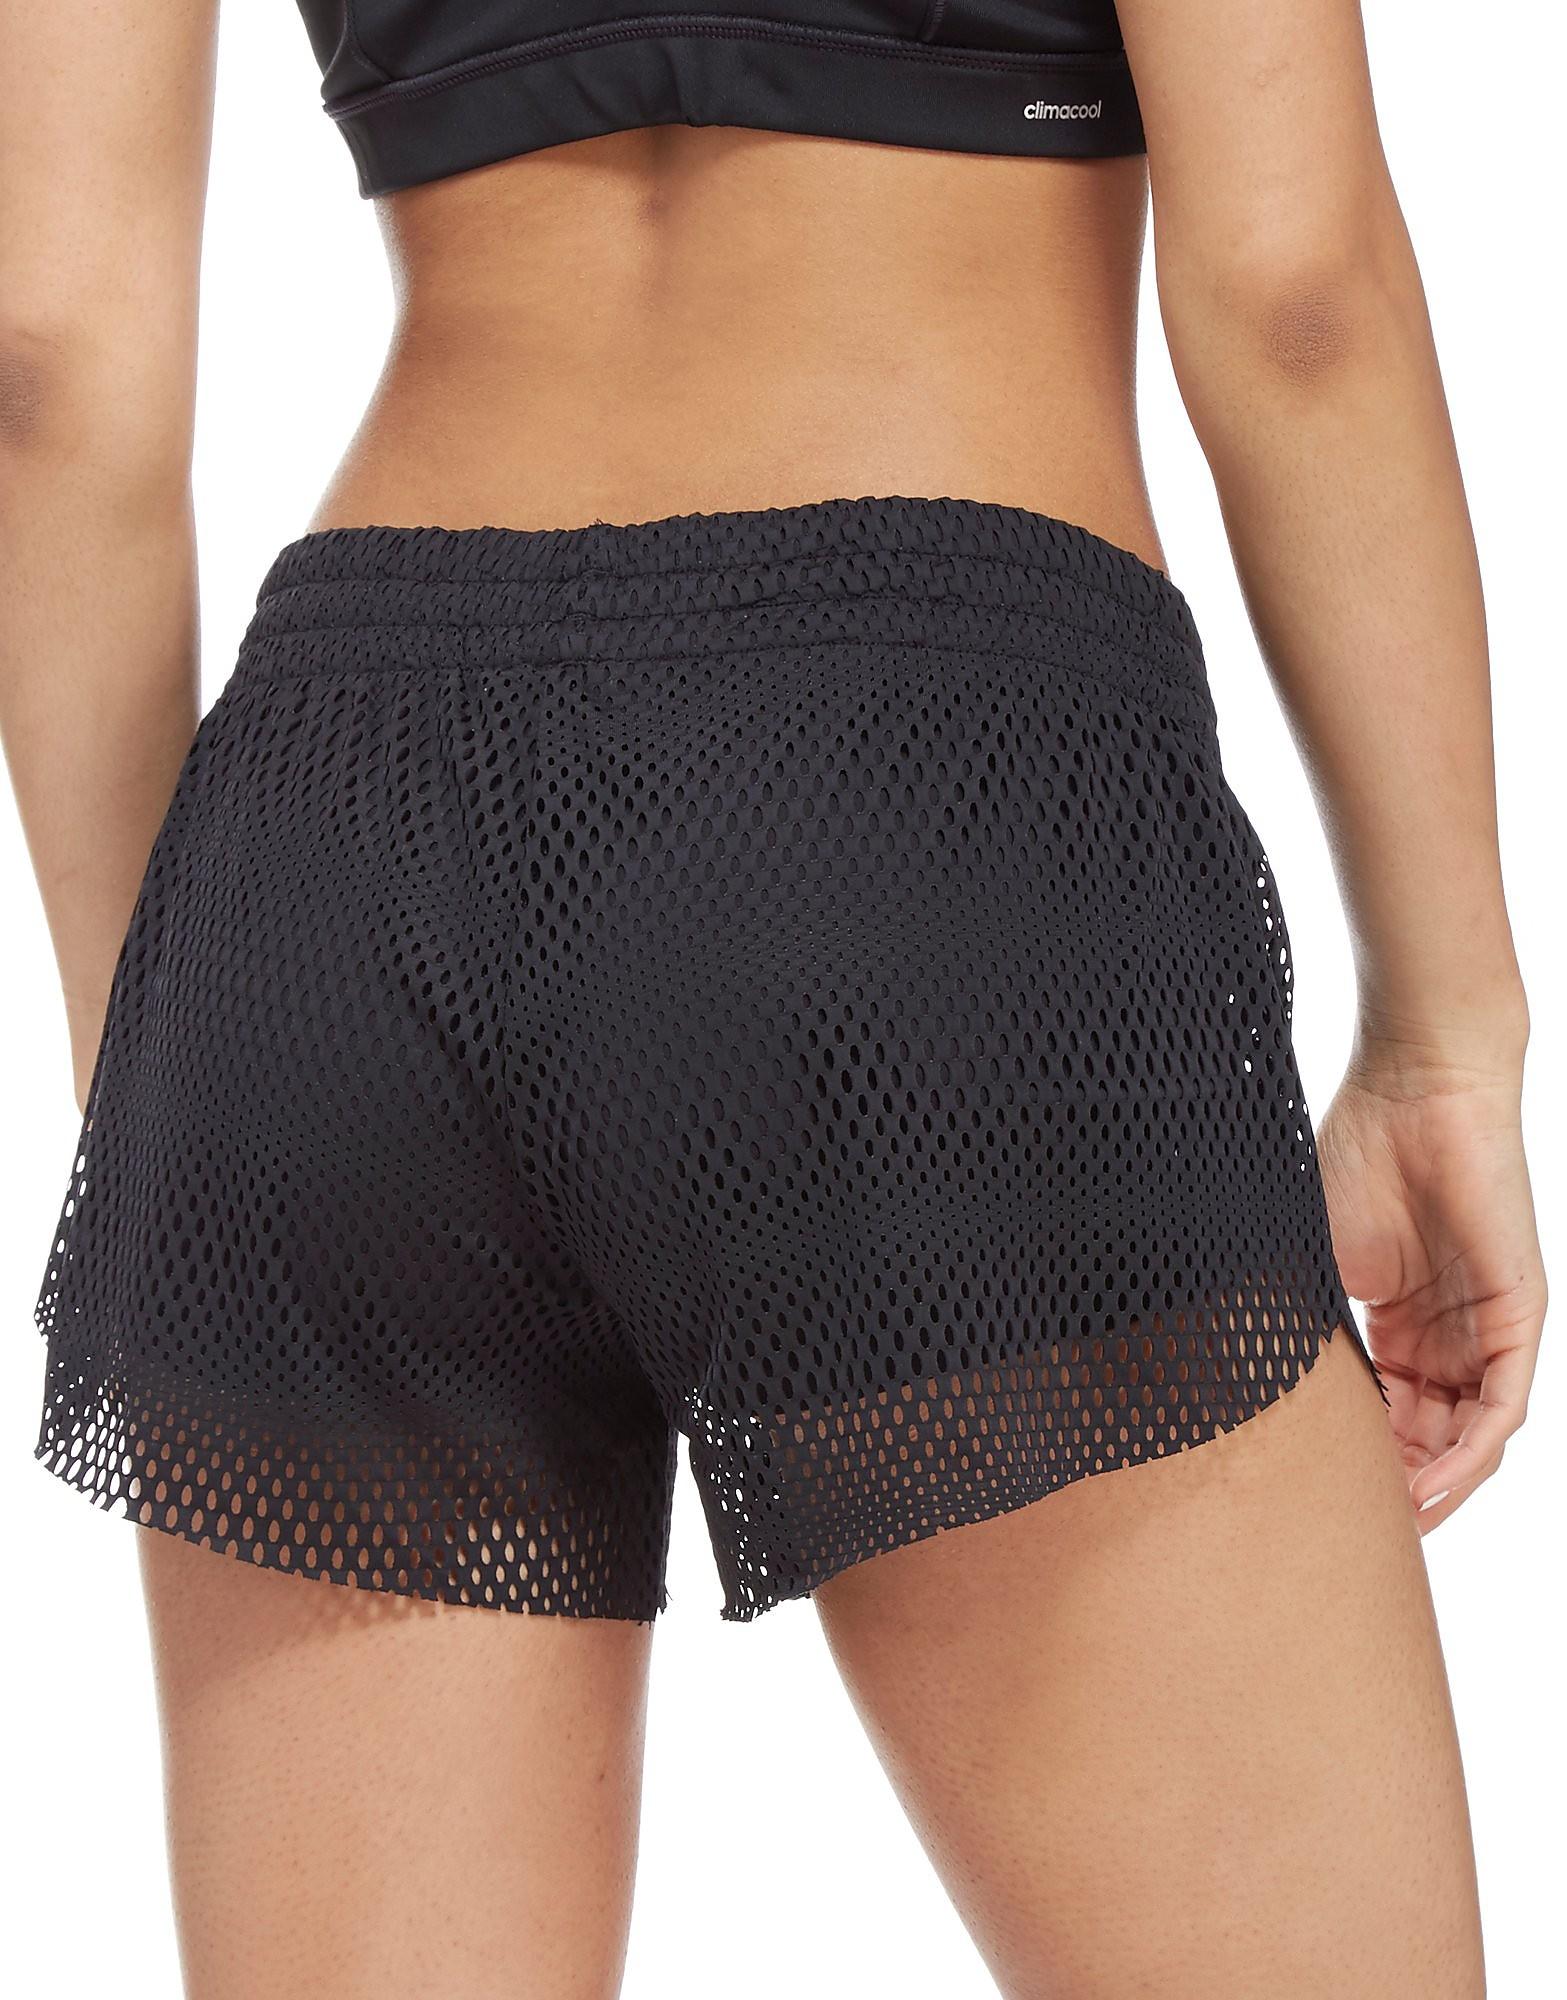 adidas 2-In-1 Mesh Shorts